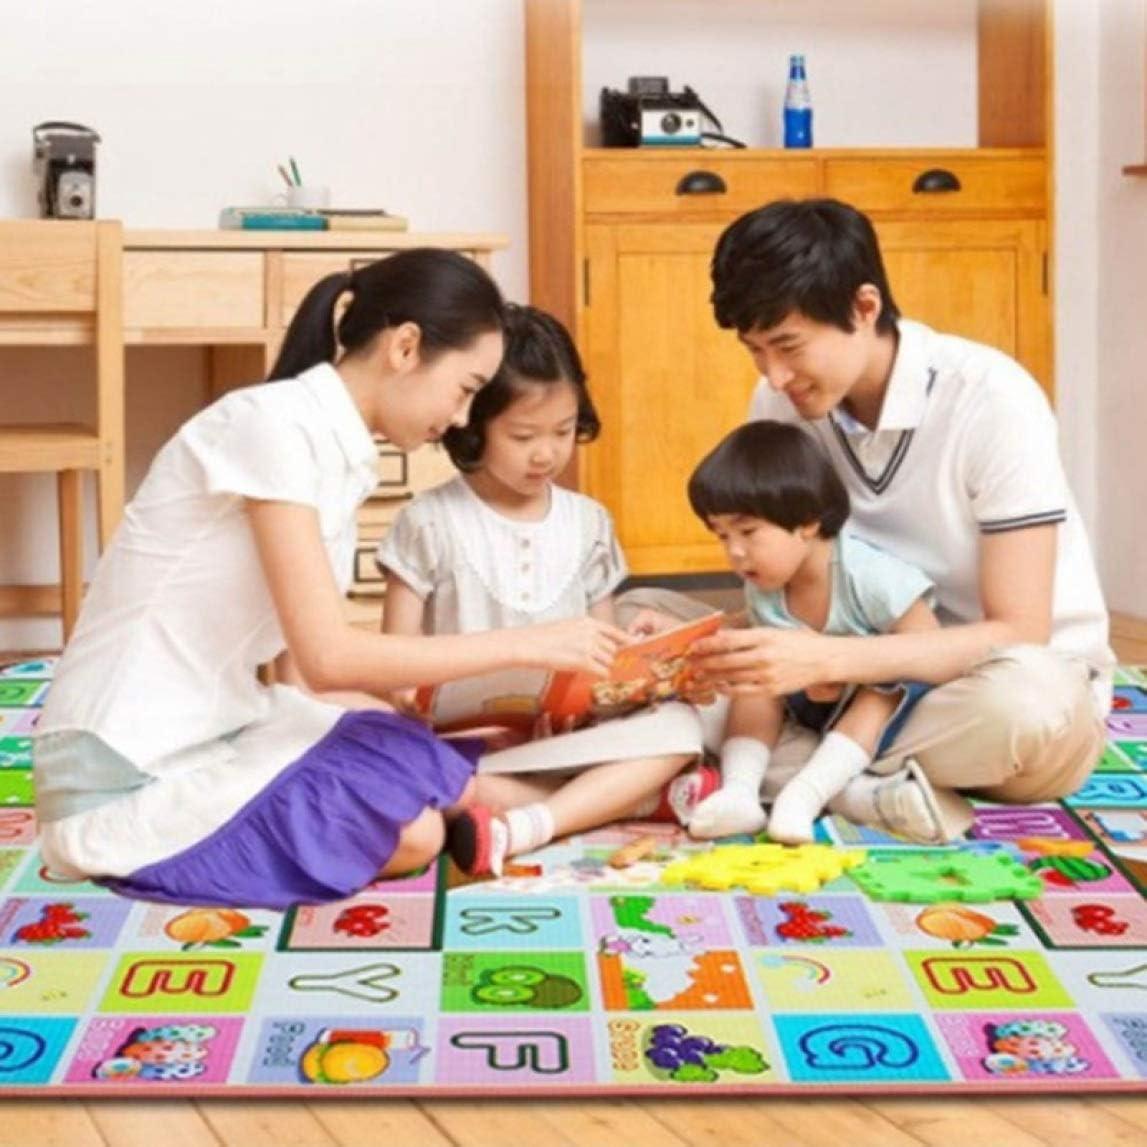 henan Smart Kids Crawling 2 Side Soft Foam Educational Game Play Mat Picnic Carpet 120X180cm None 02